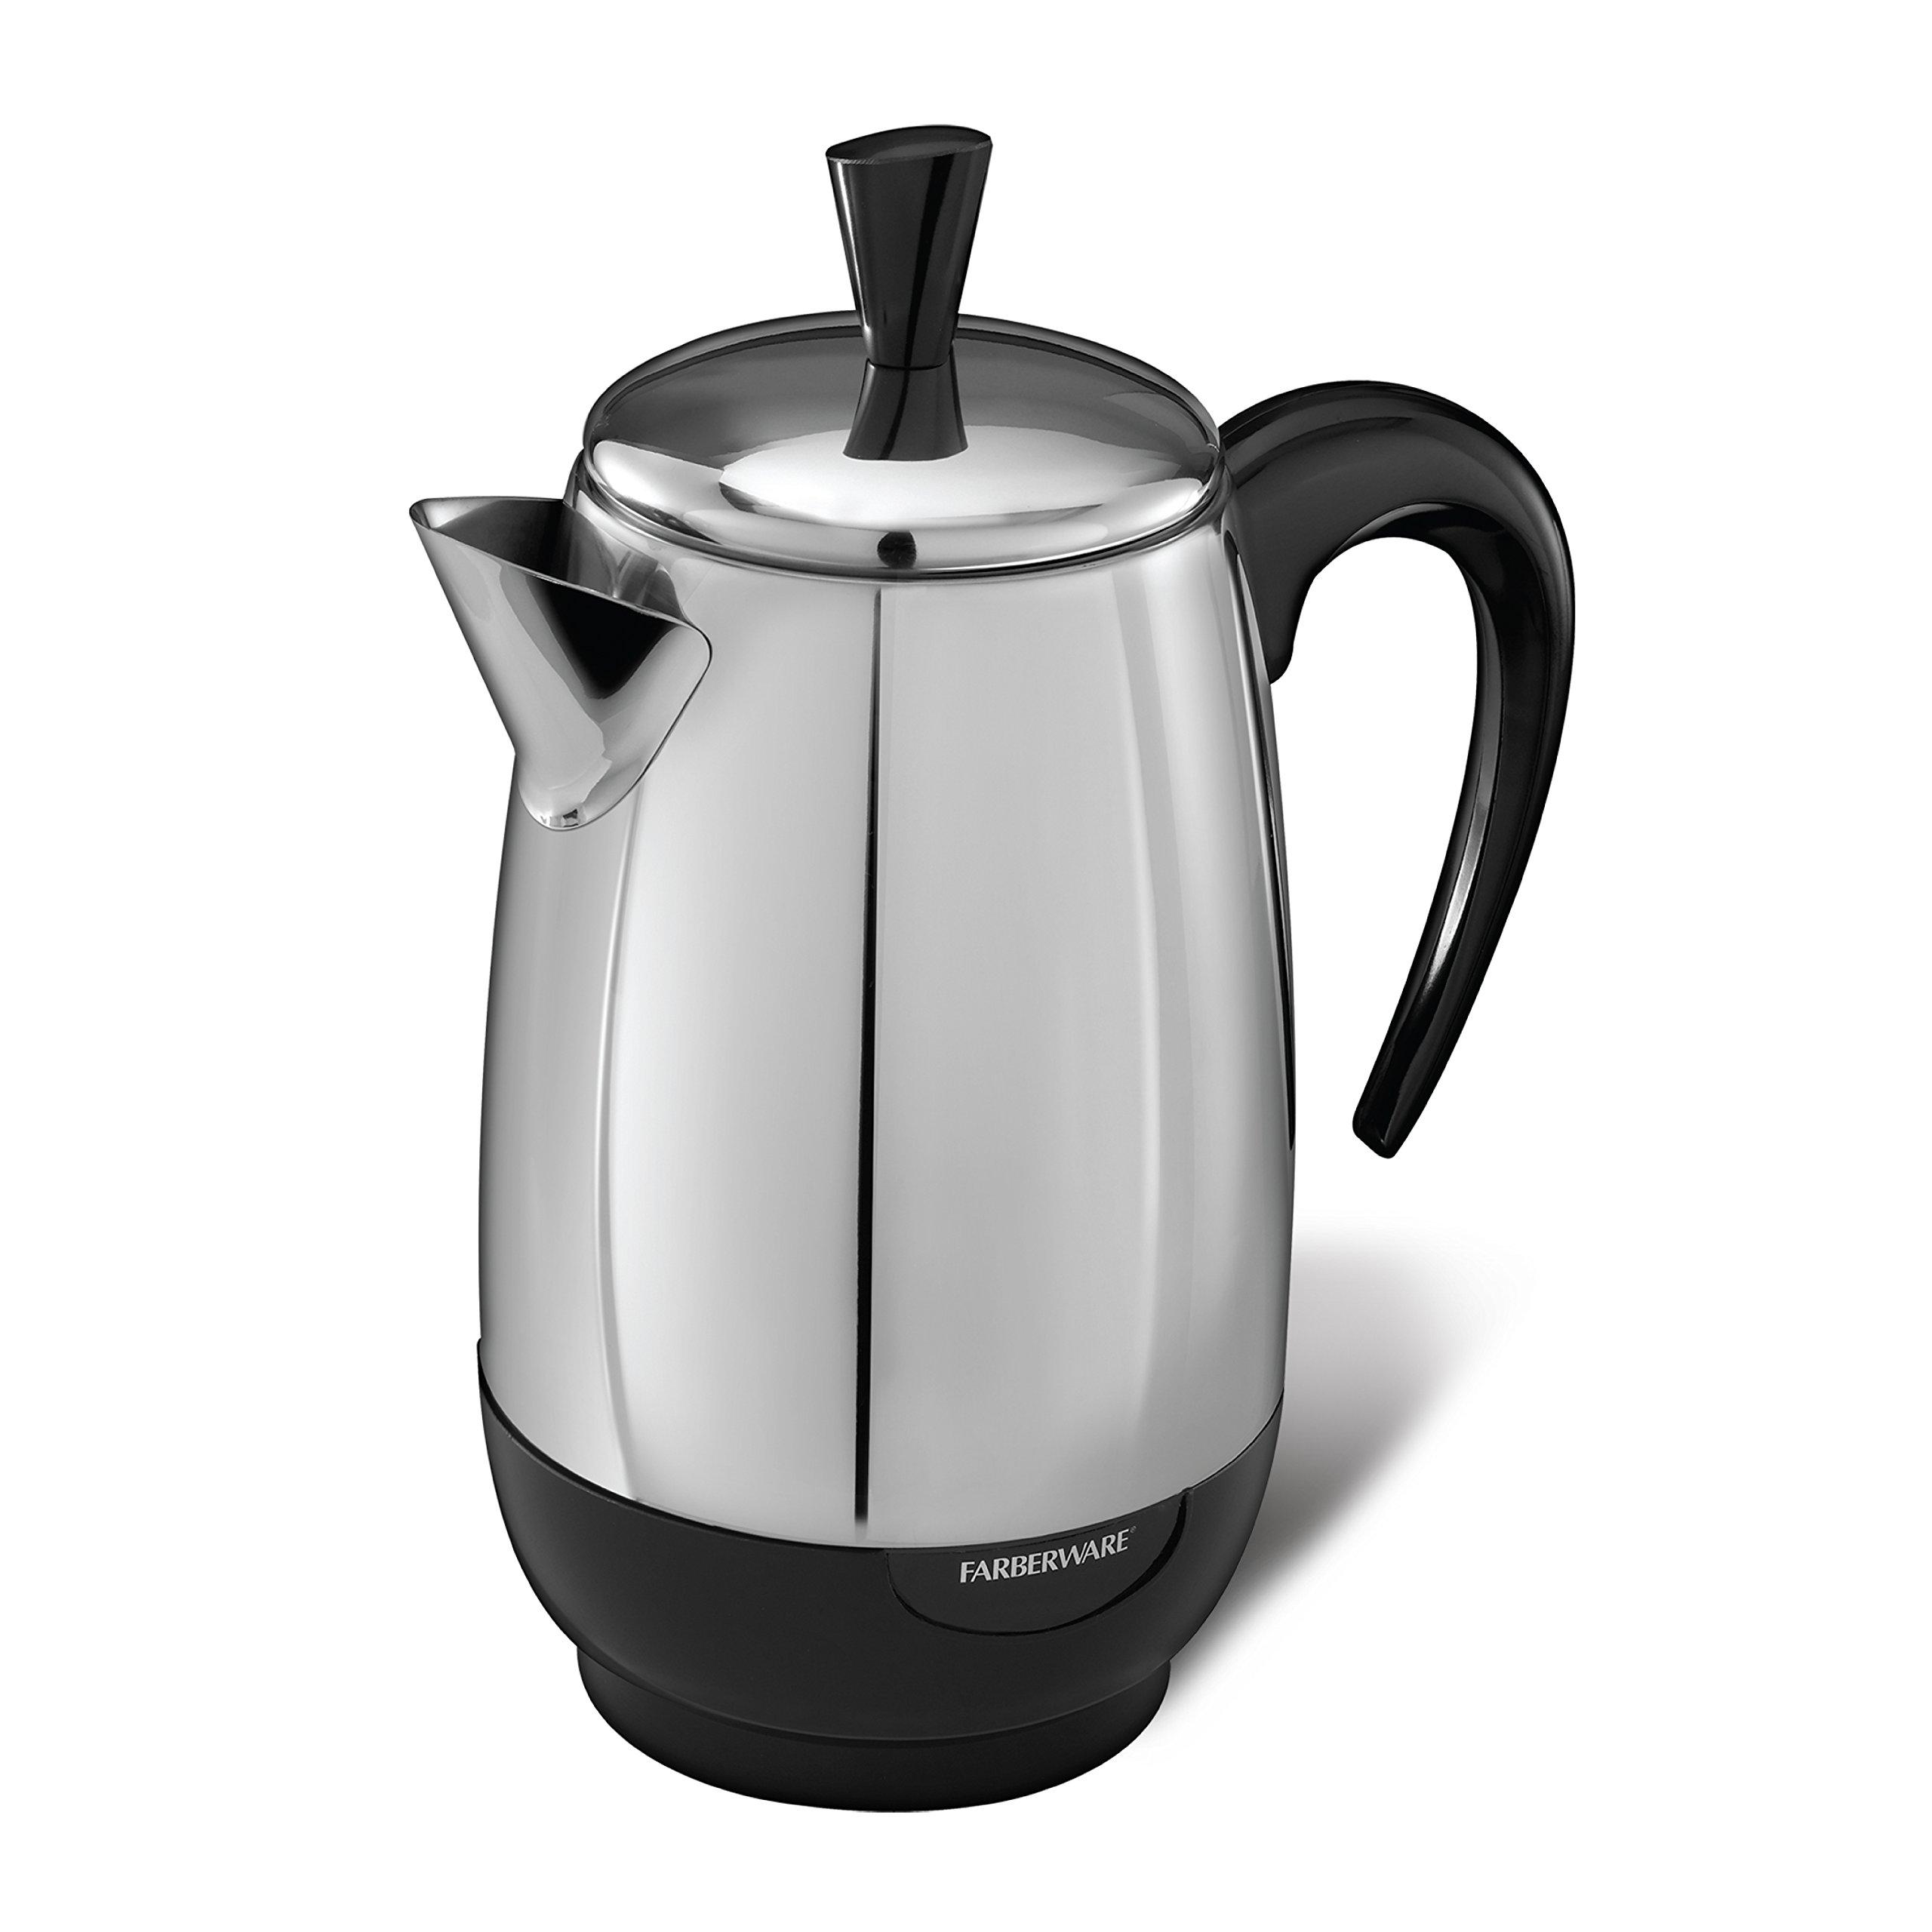 Spectrum Brands Farberware 8-Cup Percolator, Stainless Steel, FCP280, Black by Farberware